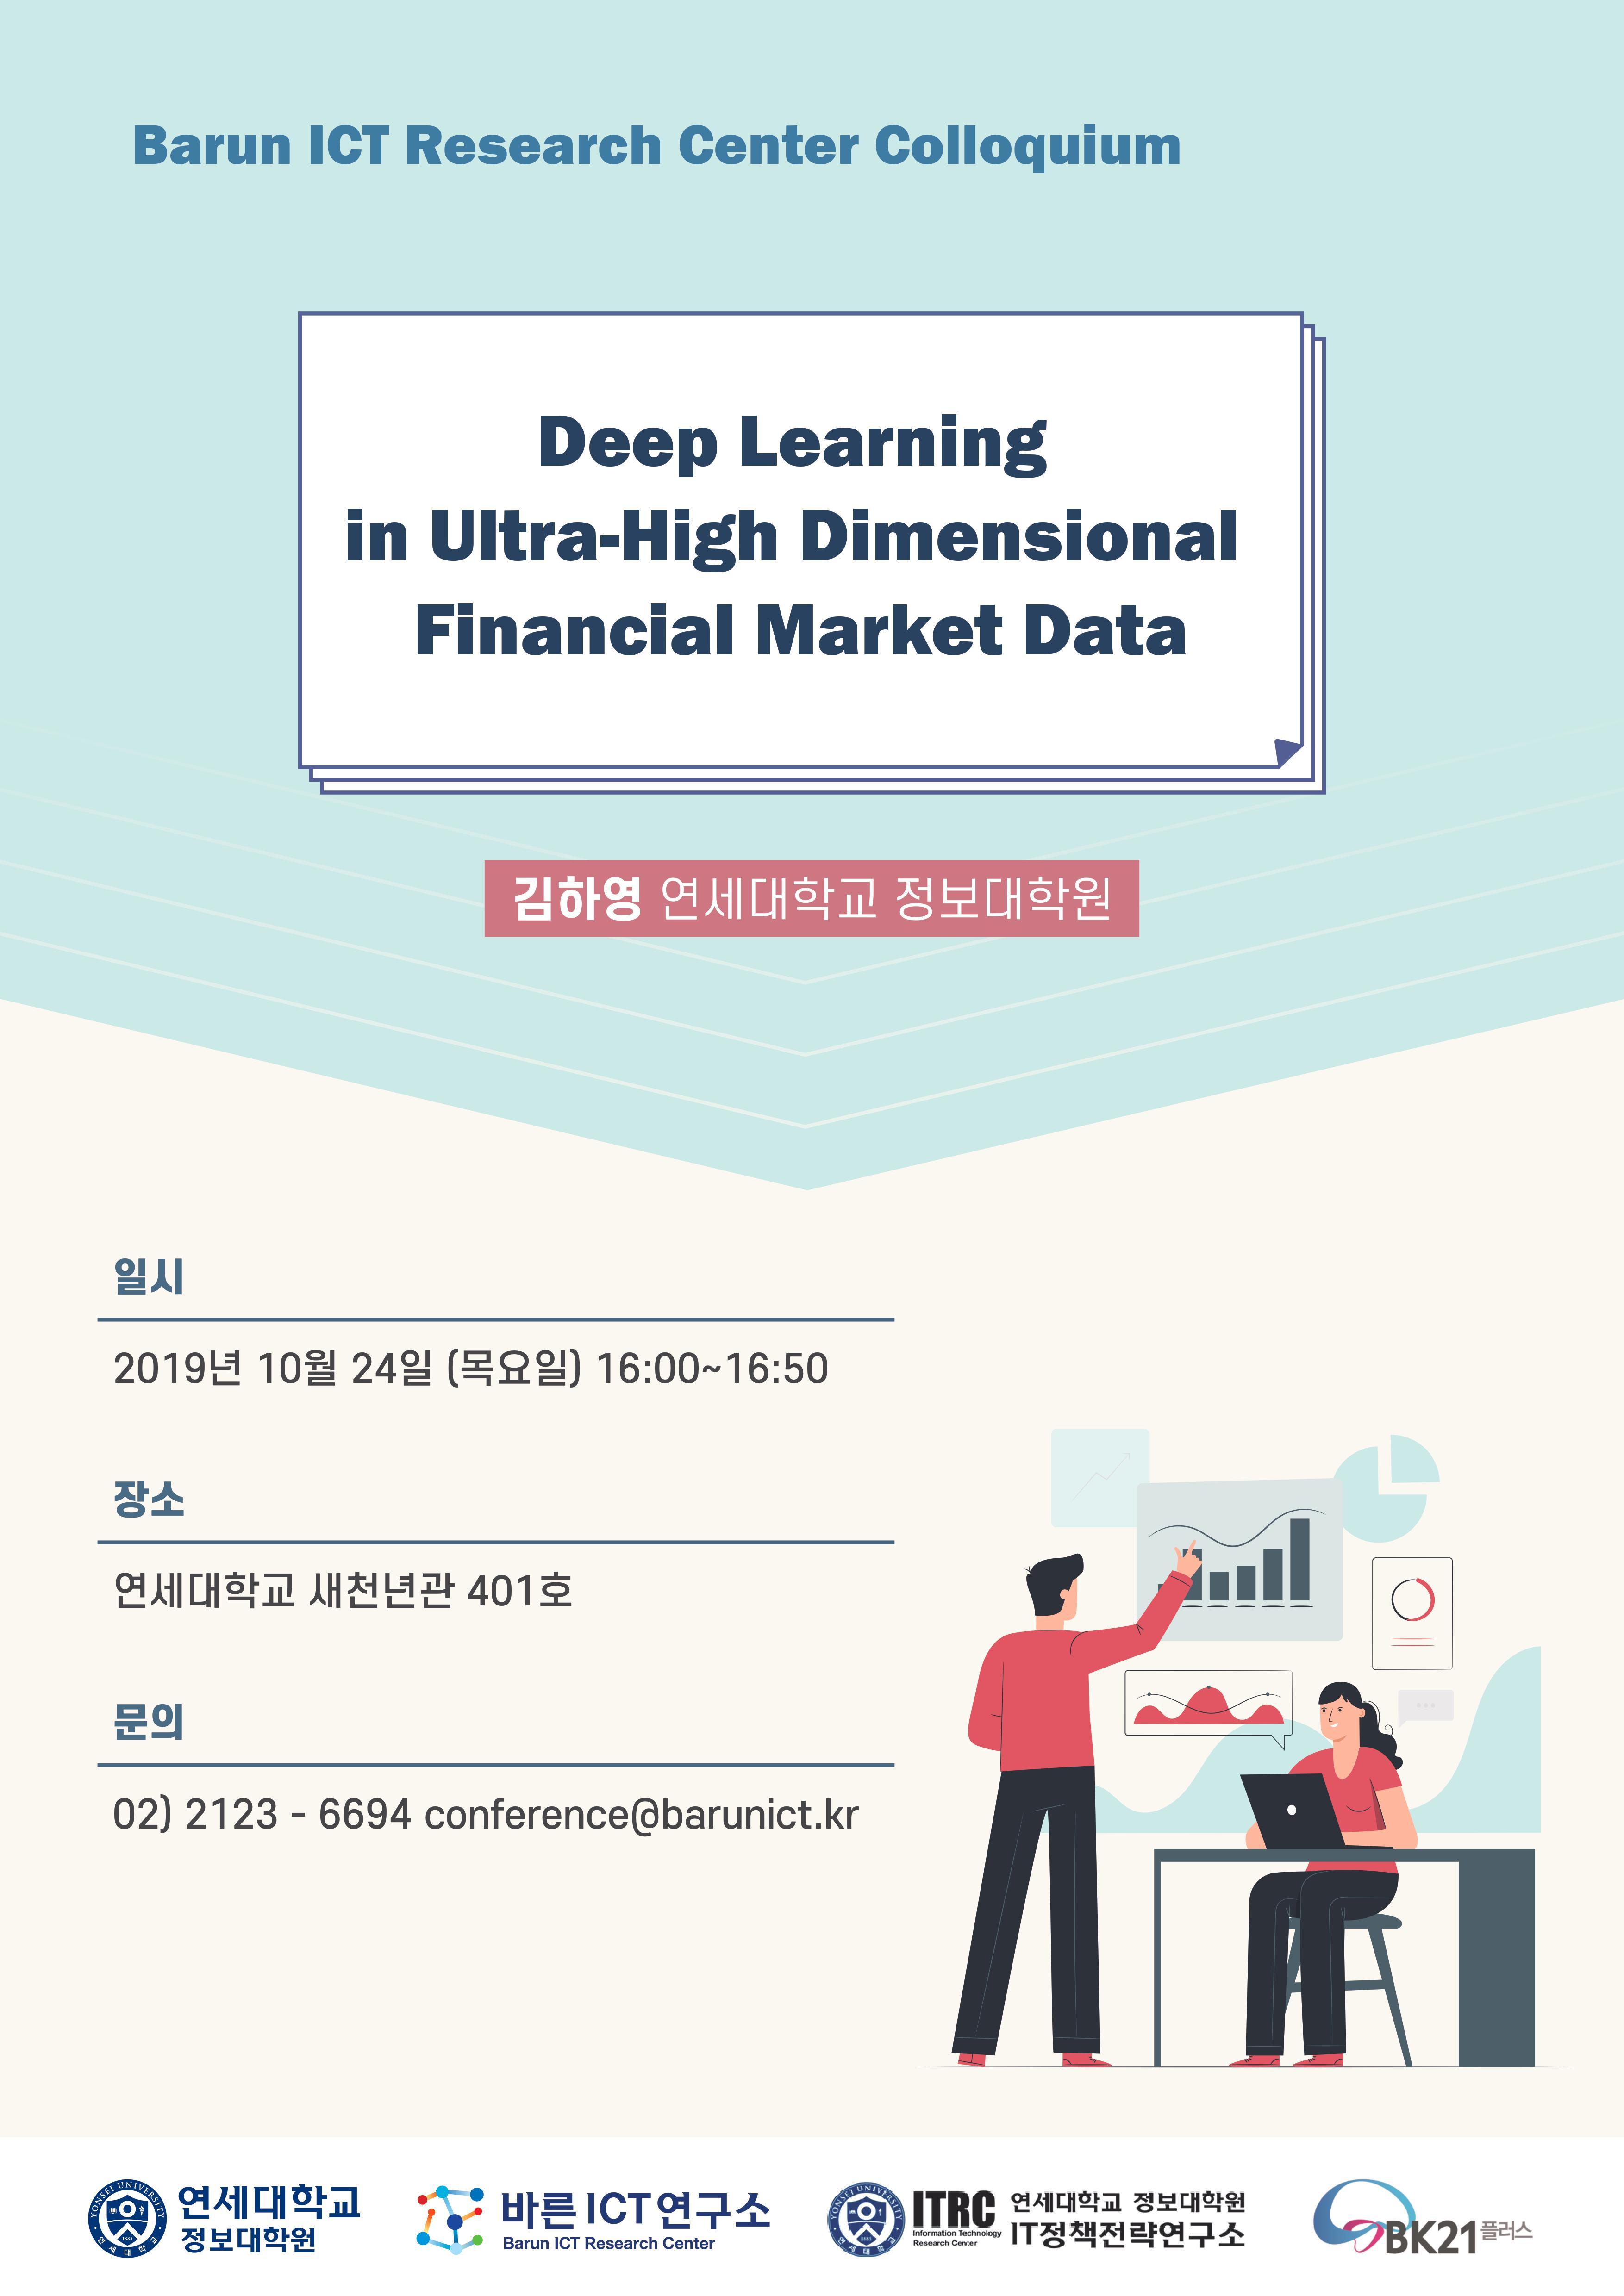 Deep Learning In Ultra-High Dimensional Financial Market Data